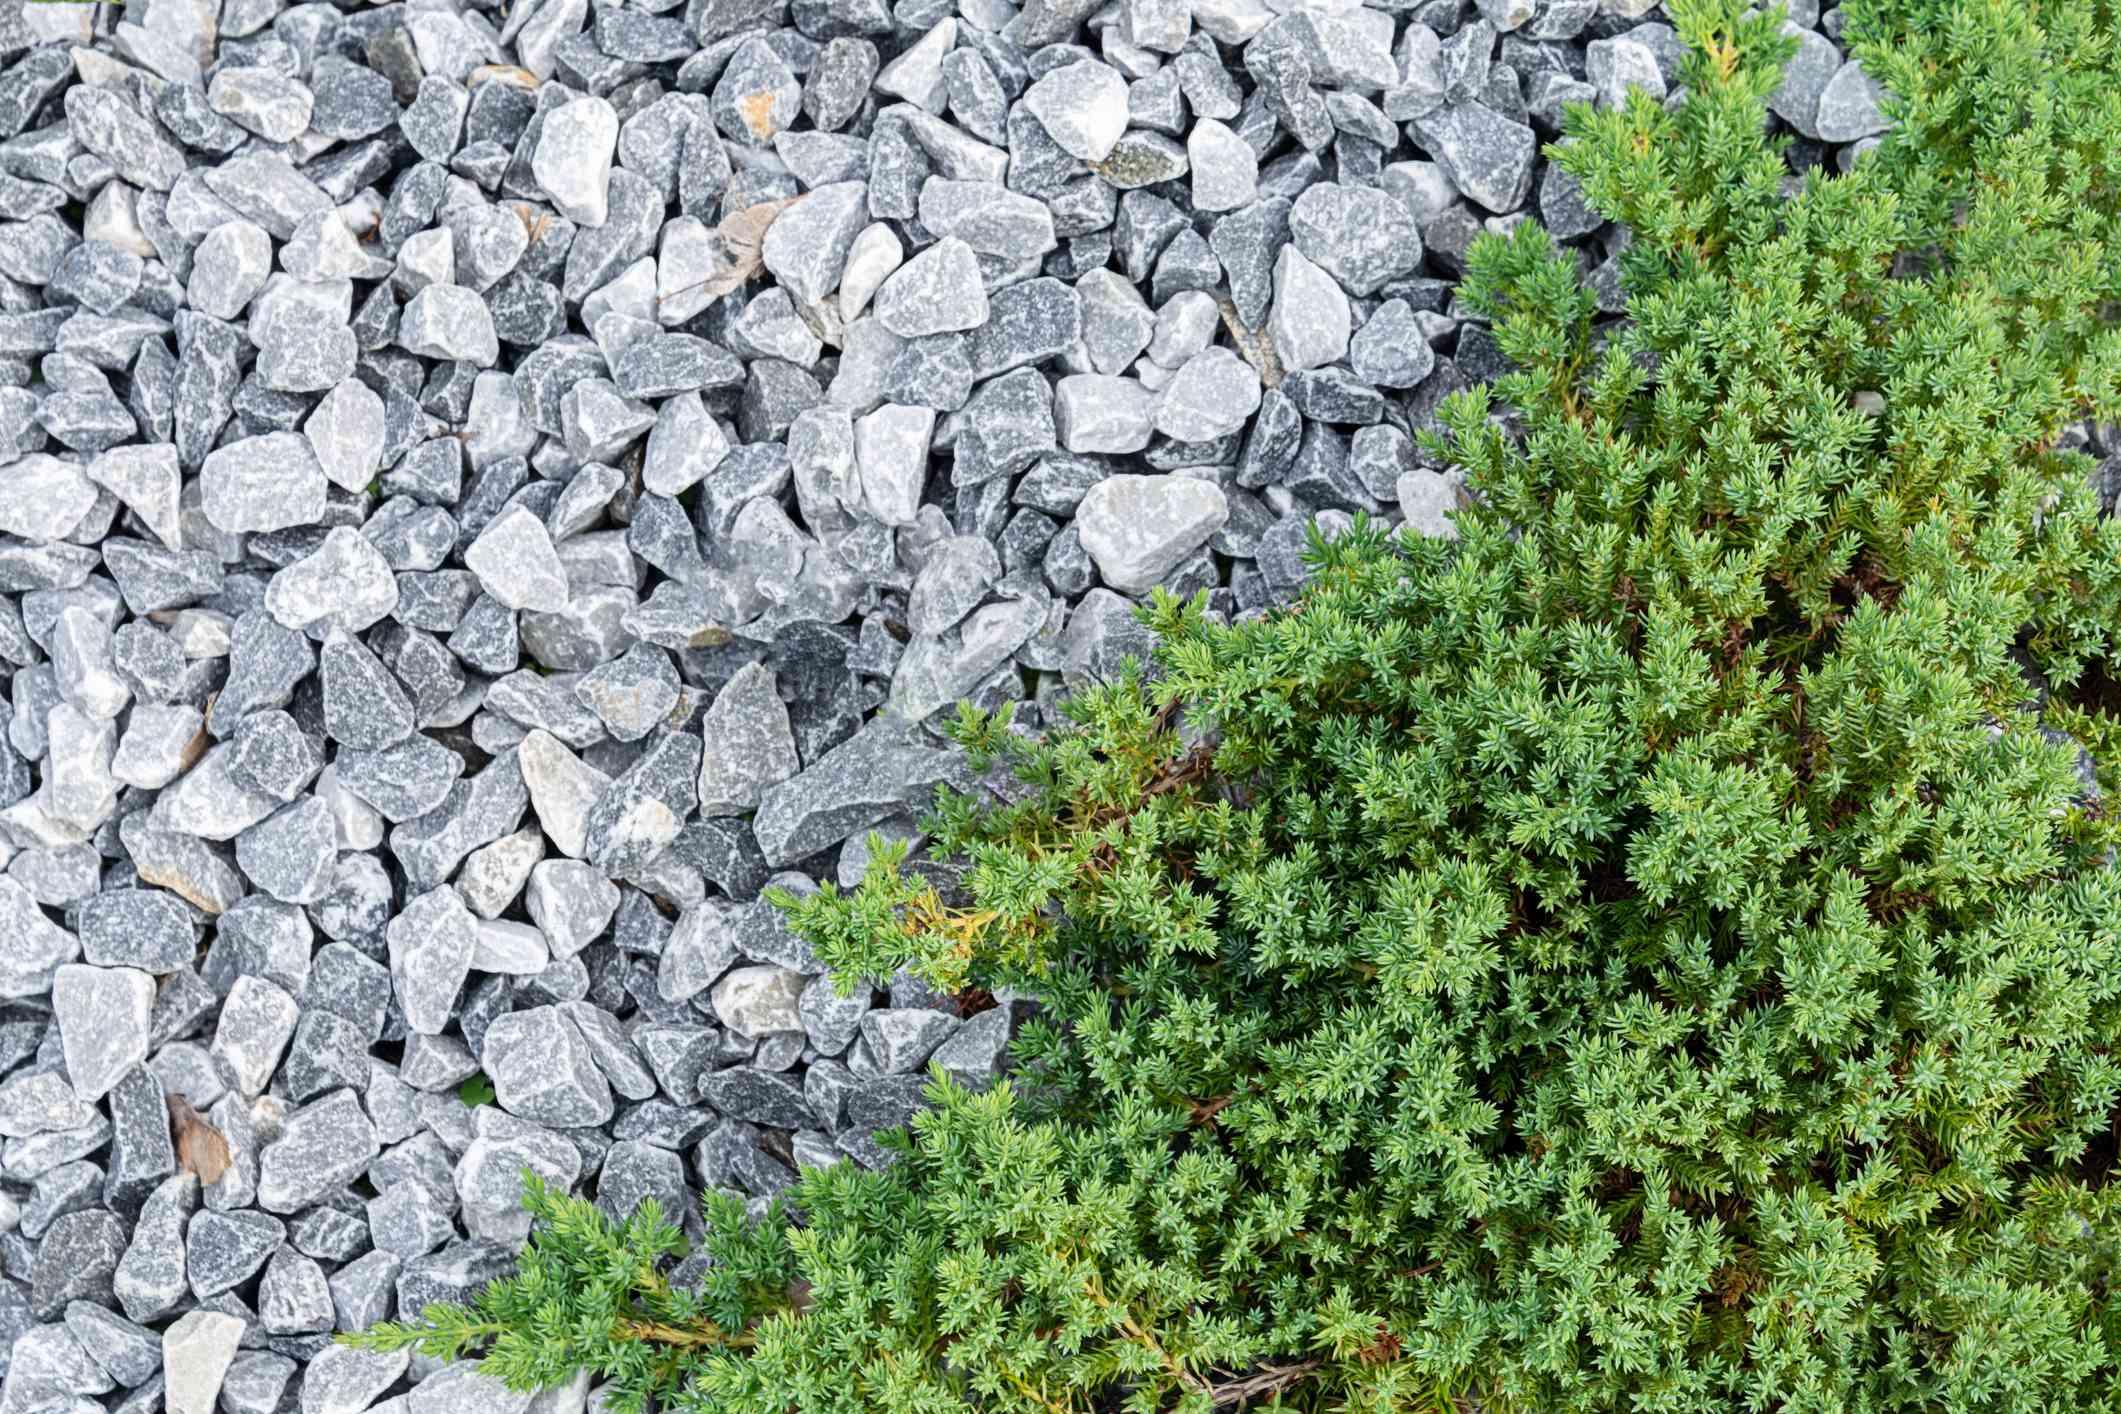 Creeping juniper taking over a rock garden